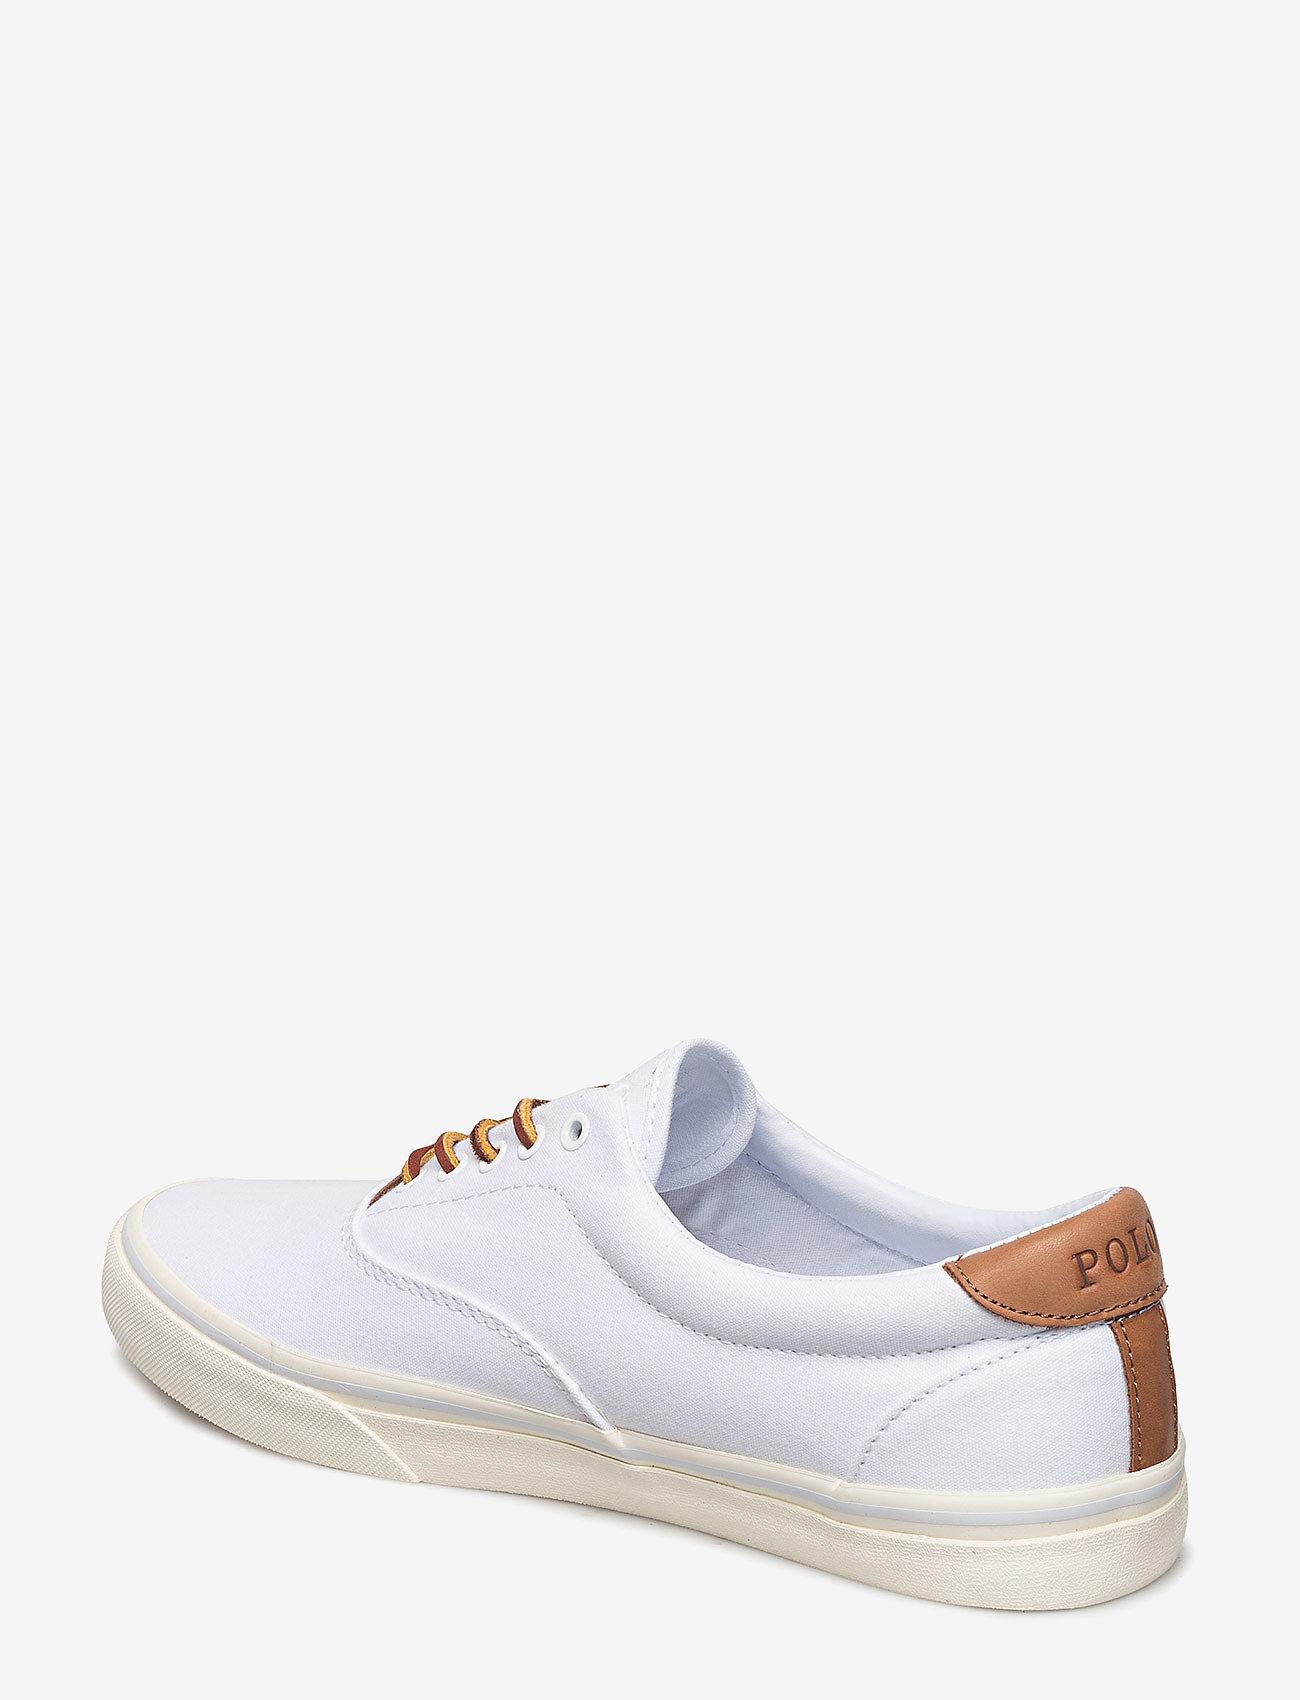 Polo Ralph Lauren Thorton Canvas Sneaker - Sneakers WHITE - Schuhe Billige